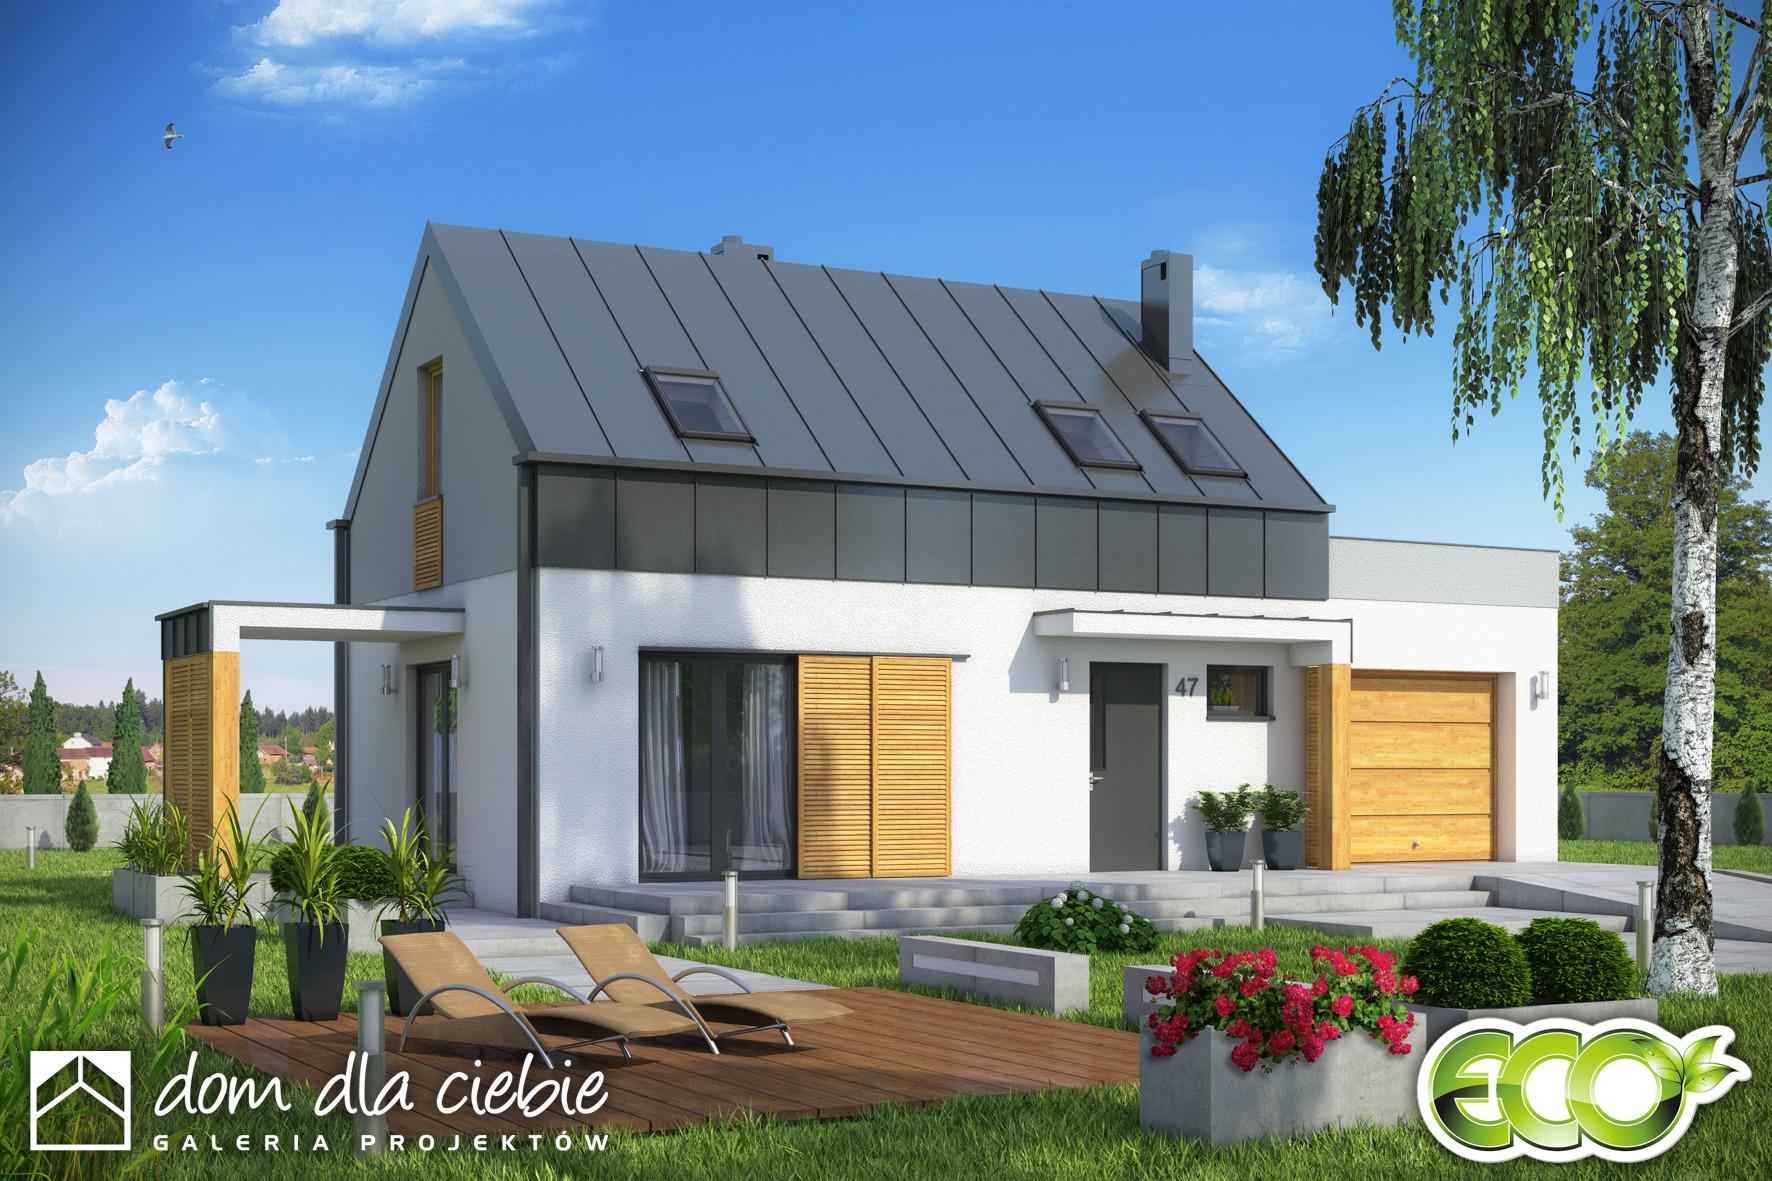 projekt domu eco 3 wariant a dom dla ciebie. Black Bedroom Furniture Sets. Home Design Ideas